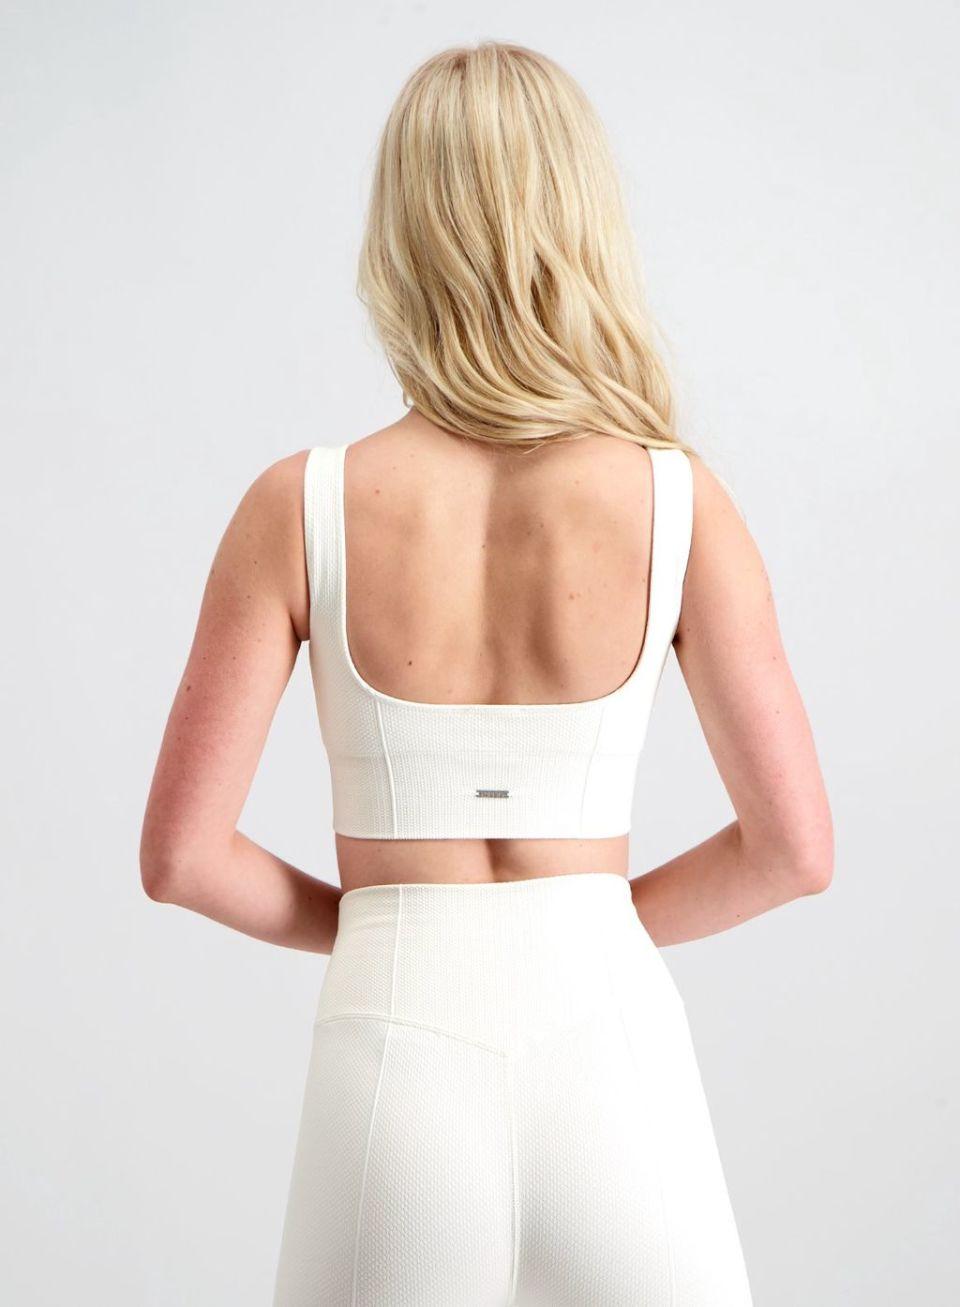 Off-White Luxe Seamless Bra